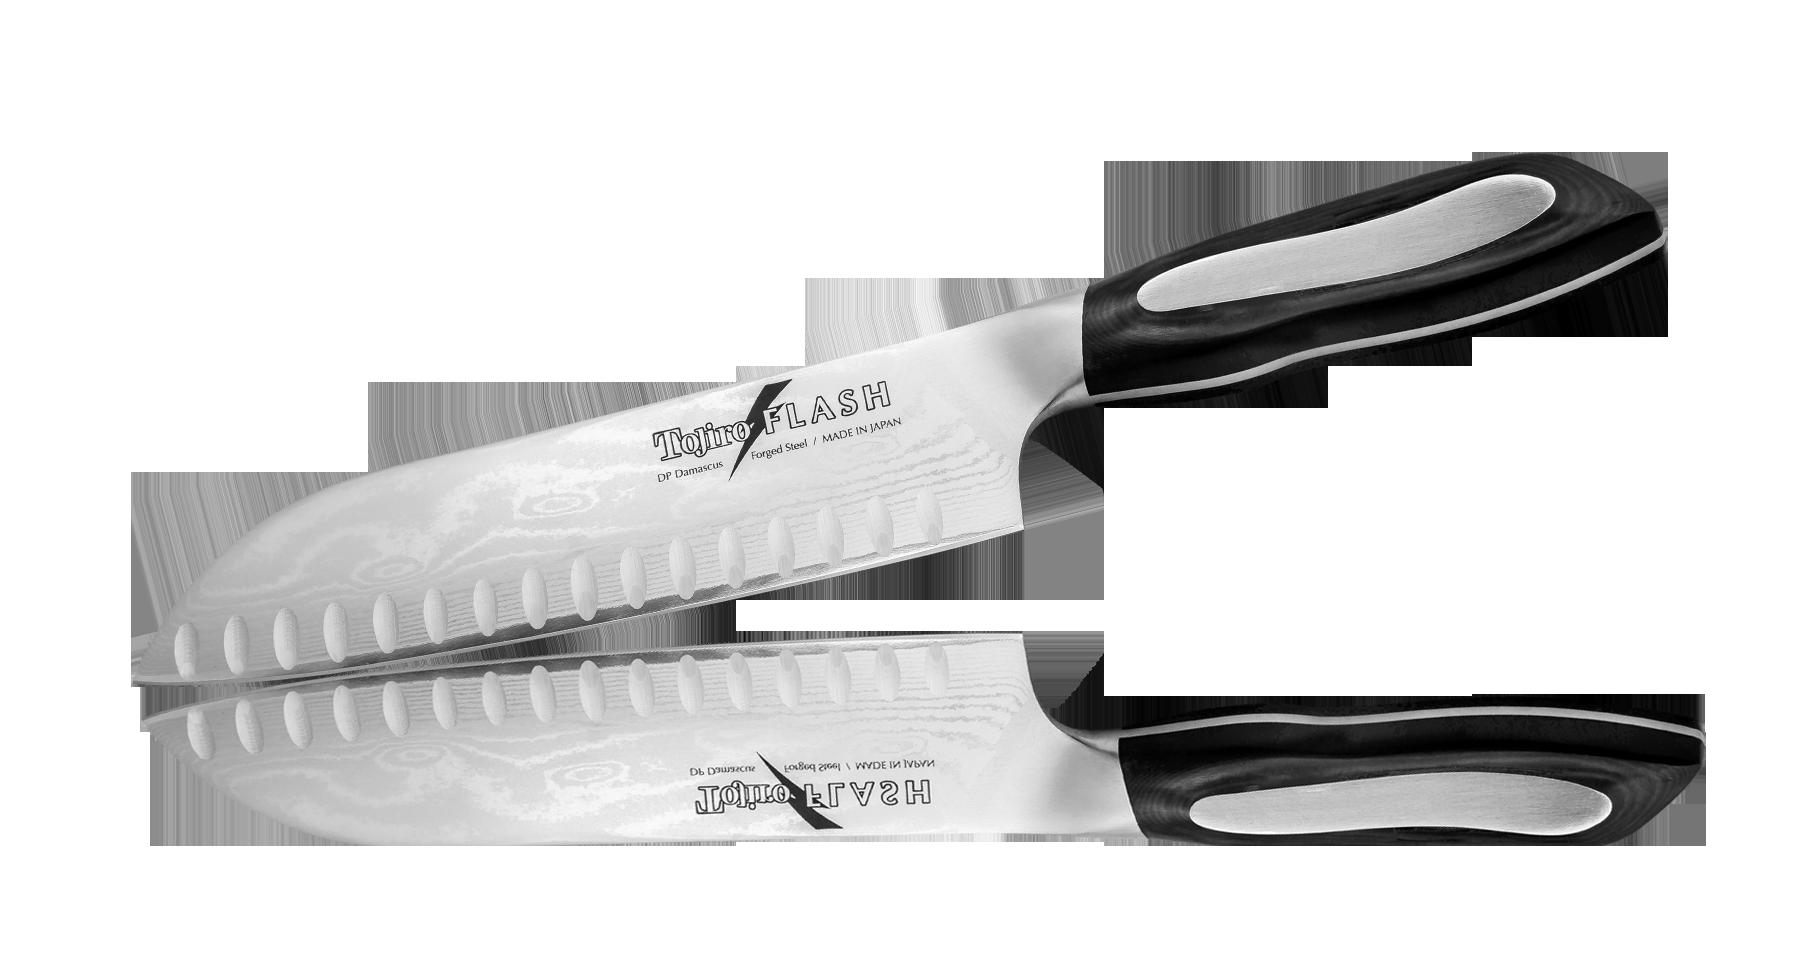 Нож Сантоку Tojiro Flash 180 мм с насечками, сталь VG-10Ножи шефа (поварские ножи)<br>Нож Сантоку Tojiro Flash 180 мм с насечками, сталь VG-10<br>